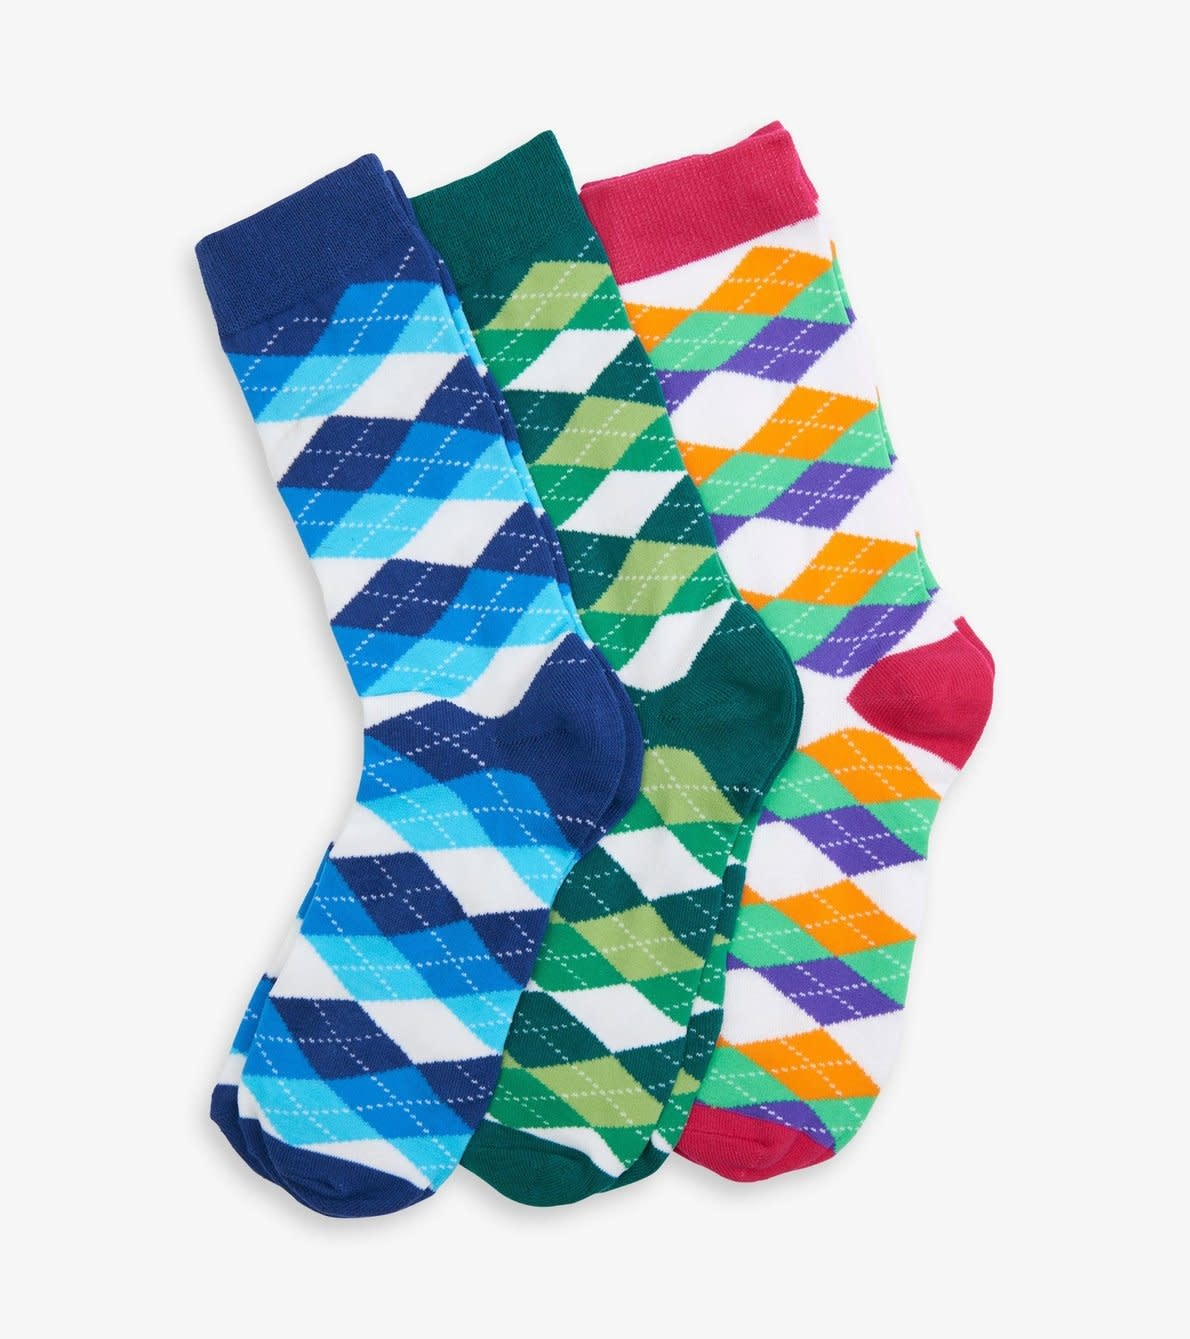 Hatley Wild Argyle Men's Crew Sock Set